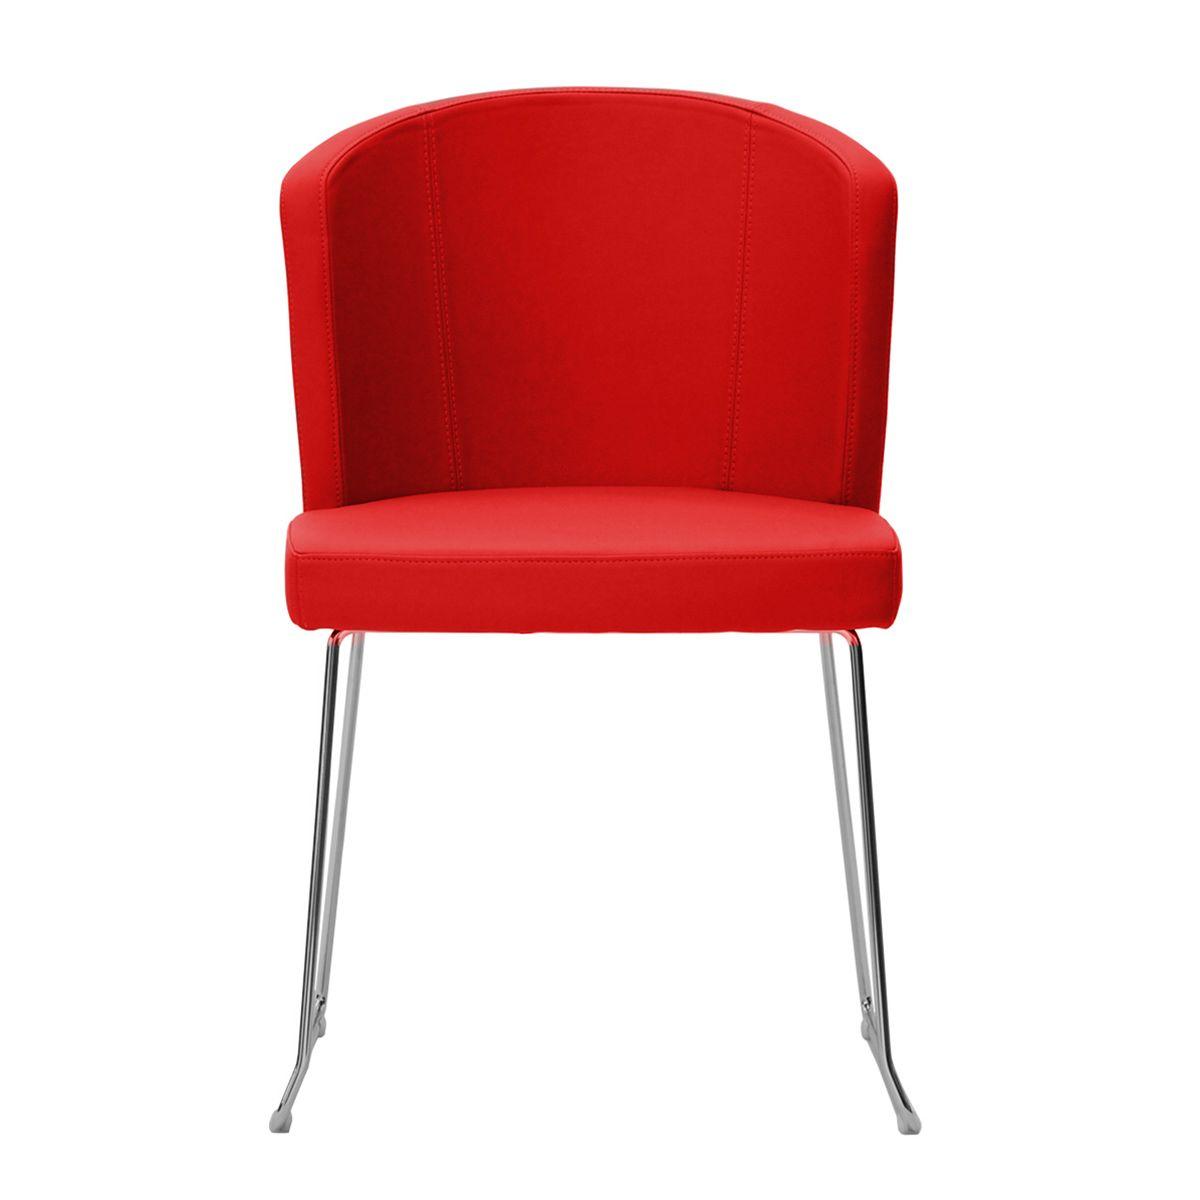 Doris s7 sedia moderna base in metallo a slitta for Sedie cucina rosse